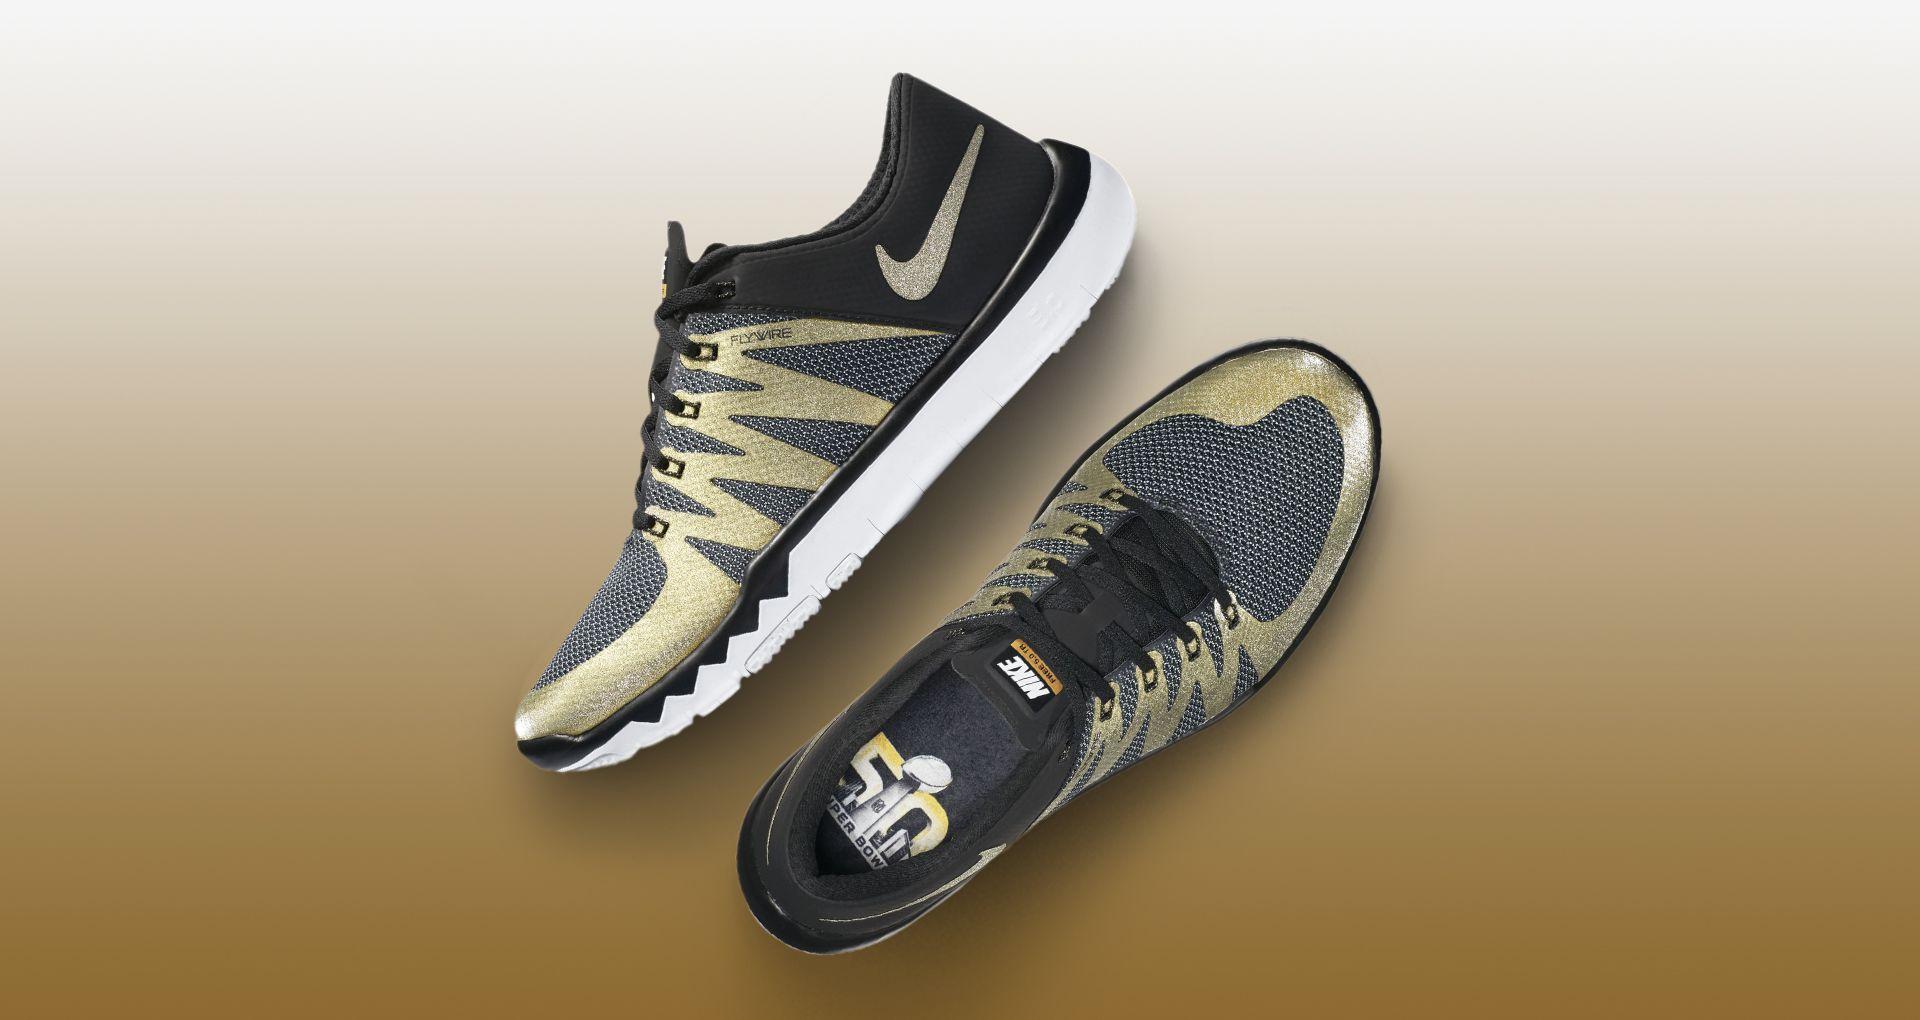 lowest price 34ebd 3d171 Nike SB50 Nike Free Trainer 5.0 V6 'Black & Metallic Gold ...